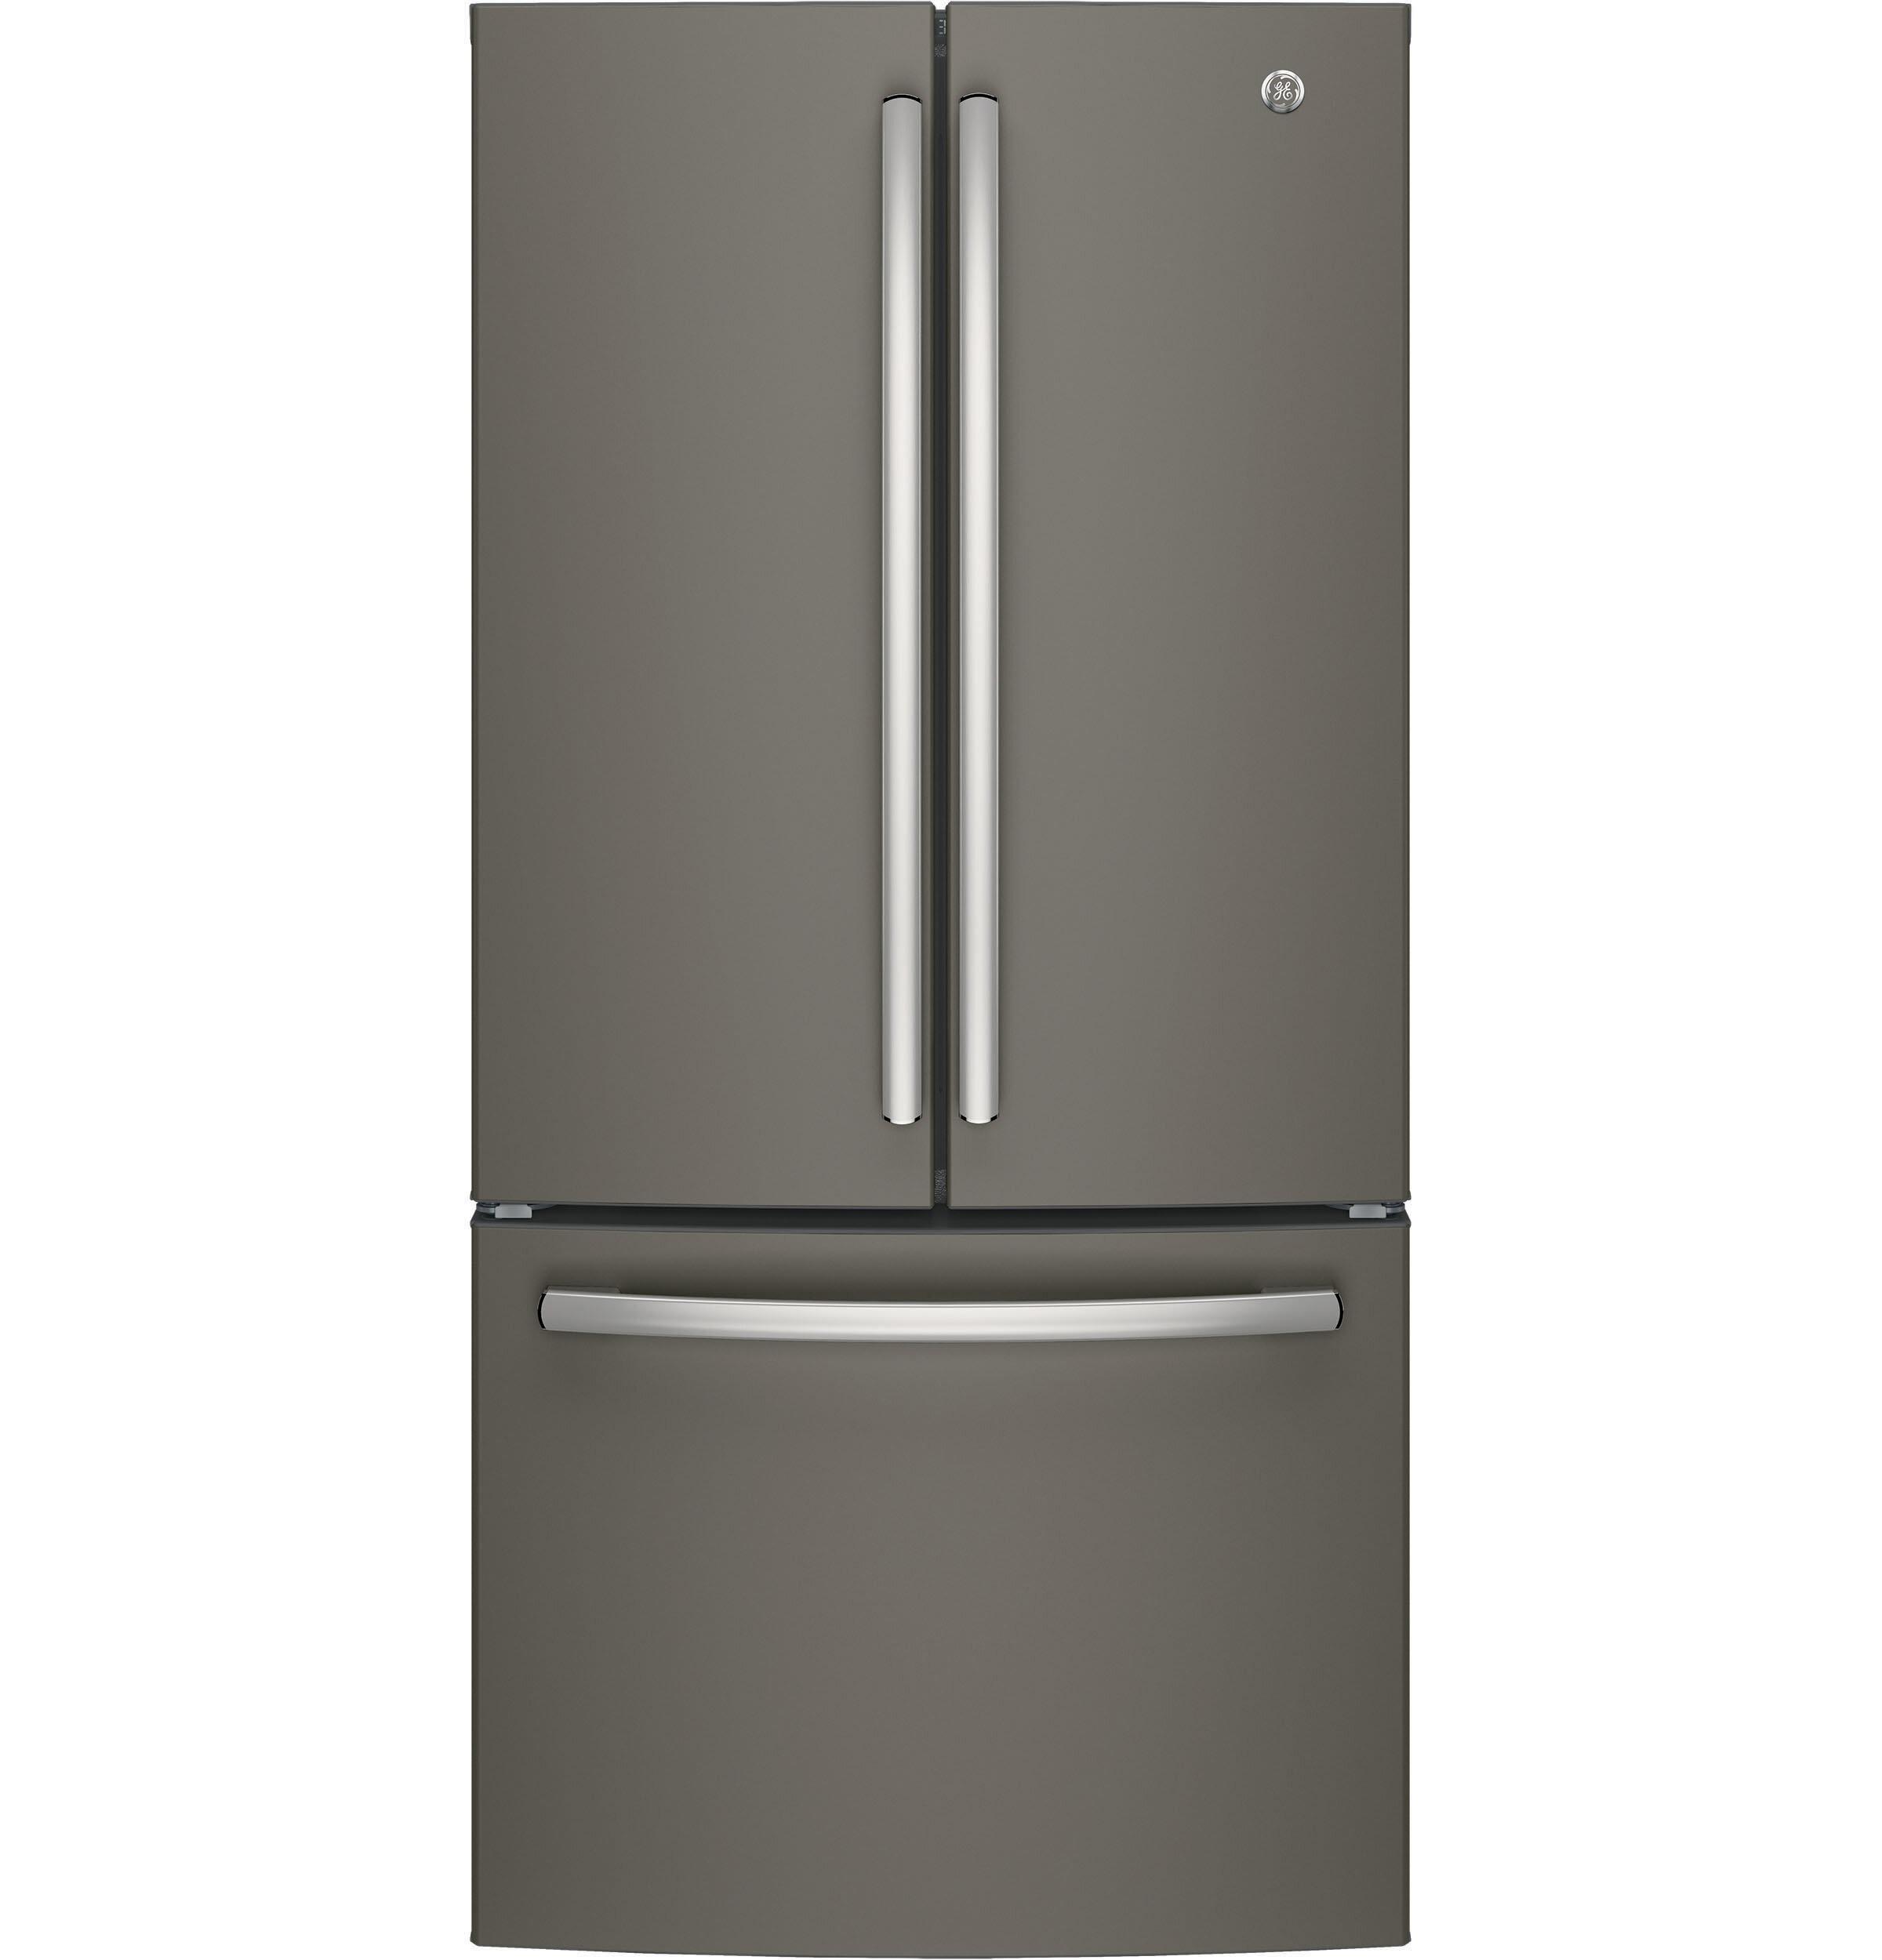 Energy Star French Door Refrigerator & Reviews - Wayfair